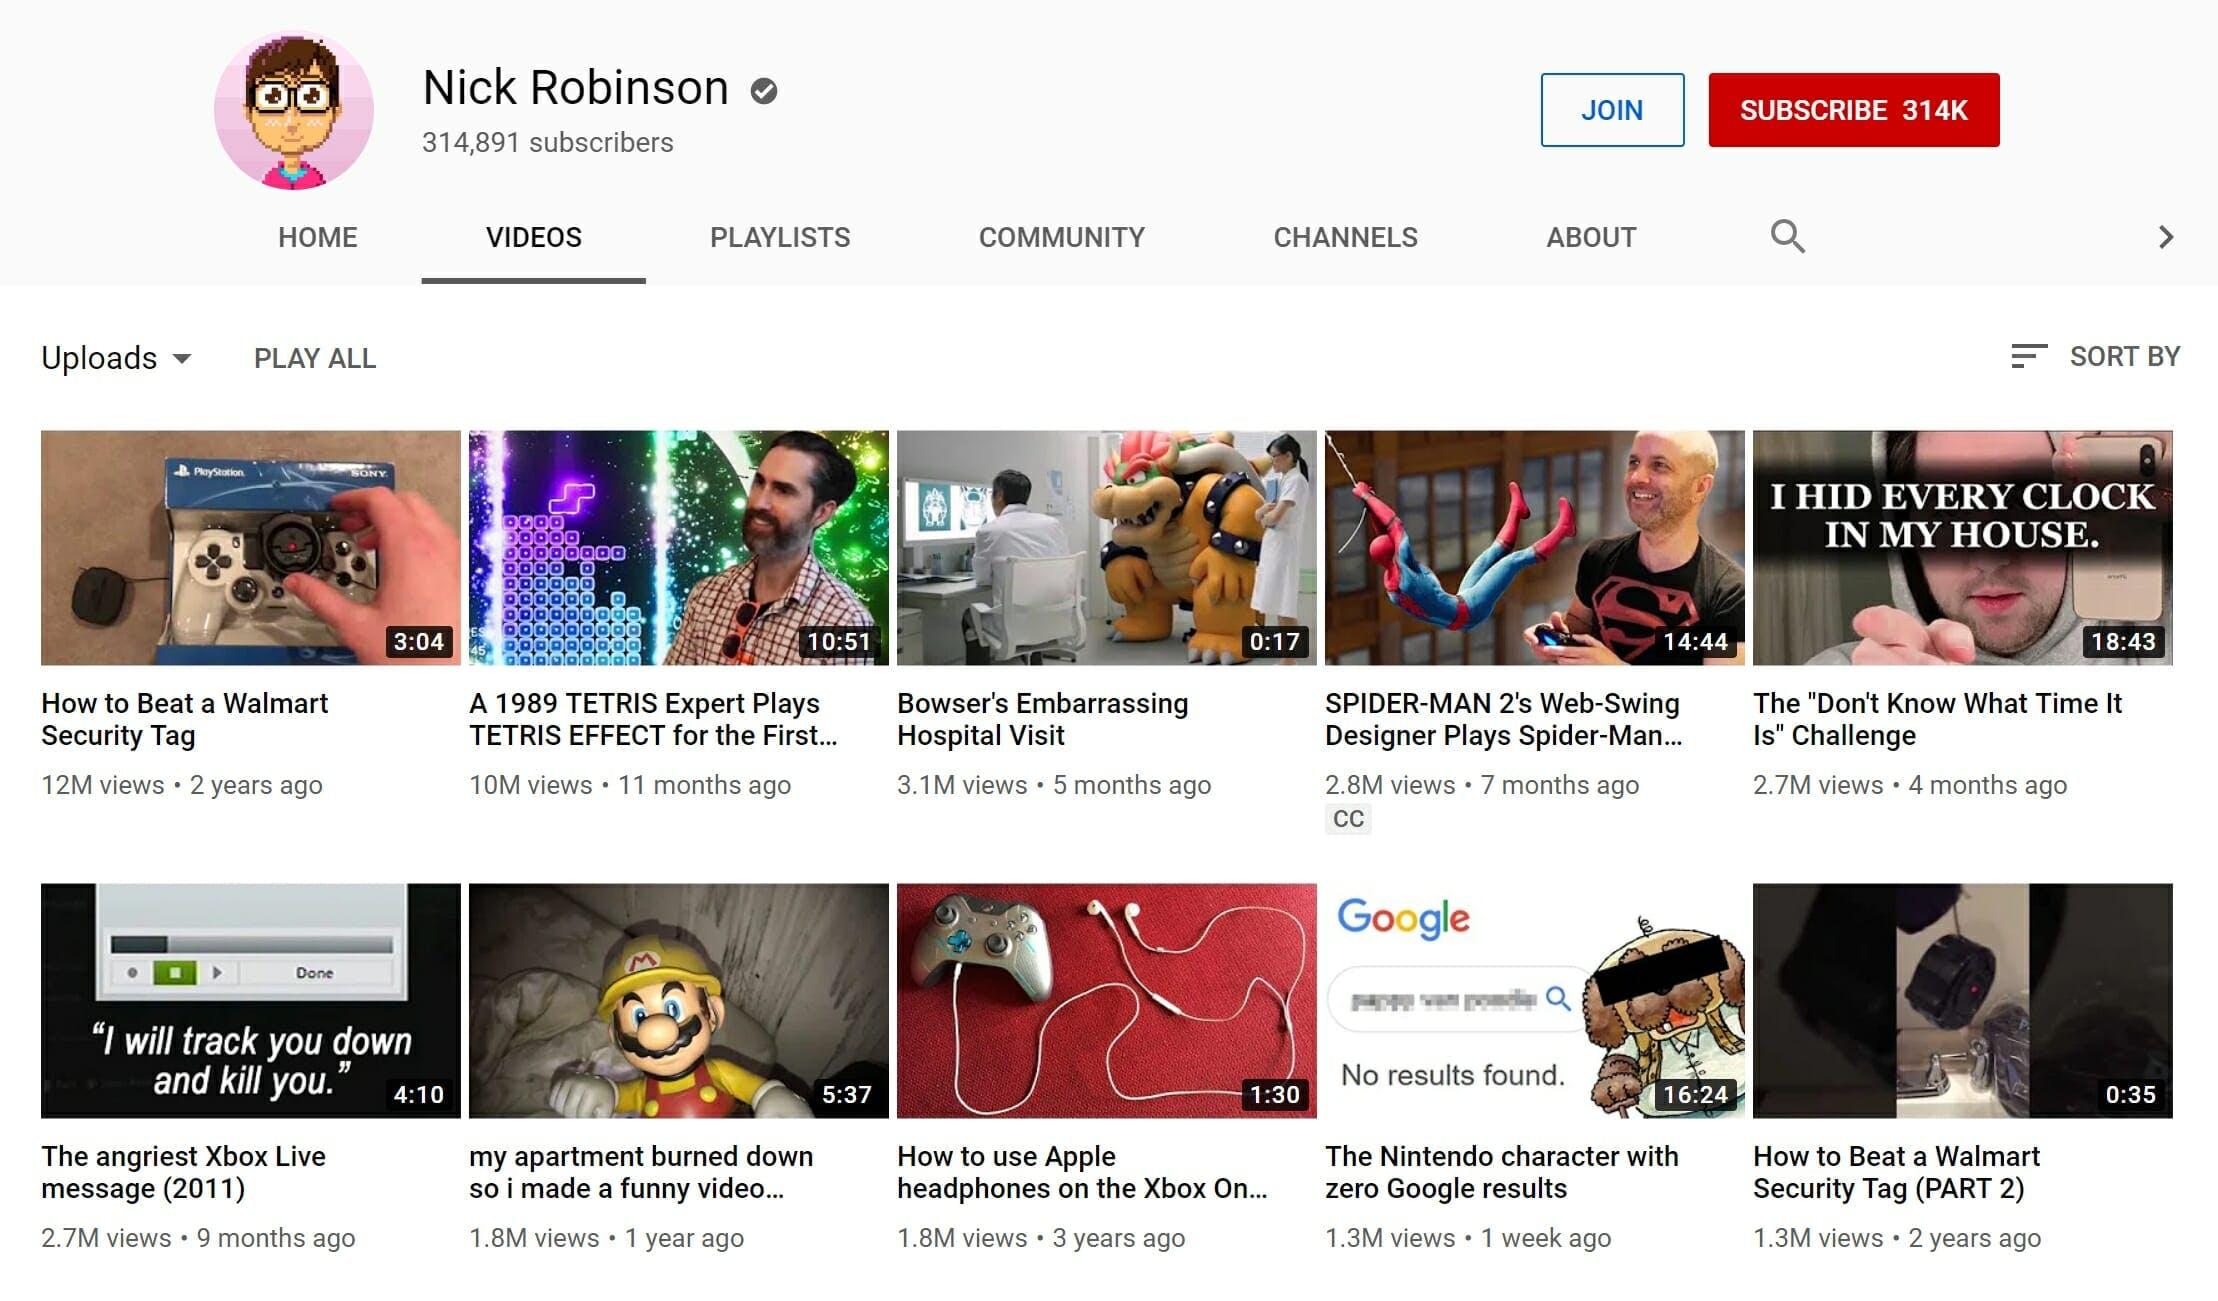 Nick Robinson YouTube